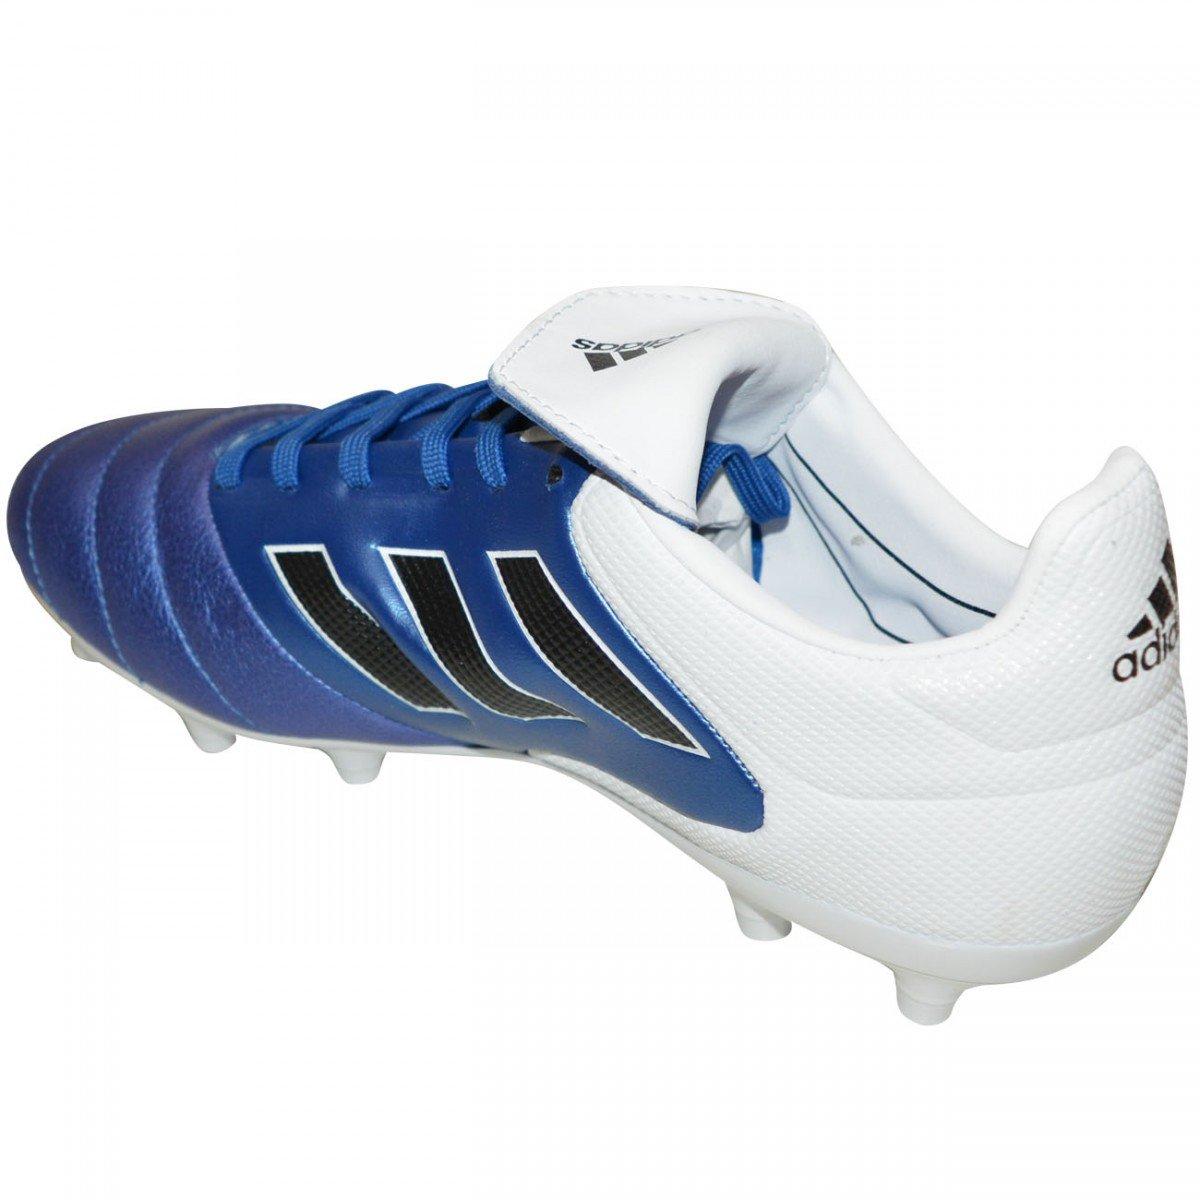 ... Chuteira Chuteira Adidas Adidas Copa Azul e Chuteira e Branco Copa  Adidas Copa Azul Branco Azul ... efdd36aff377e